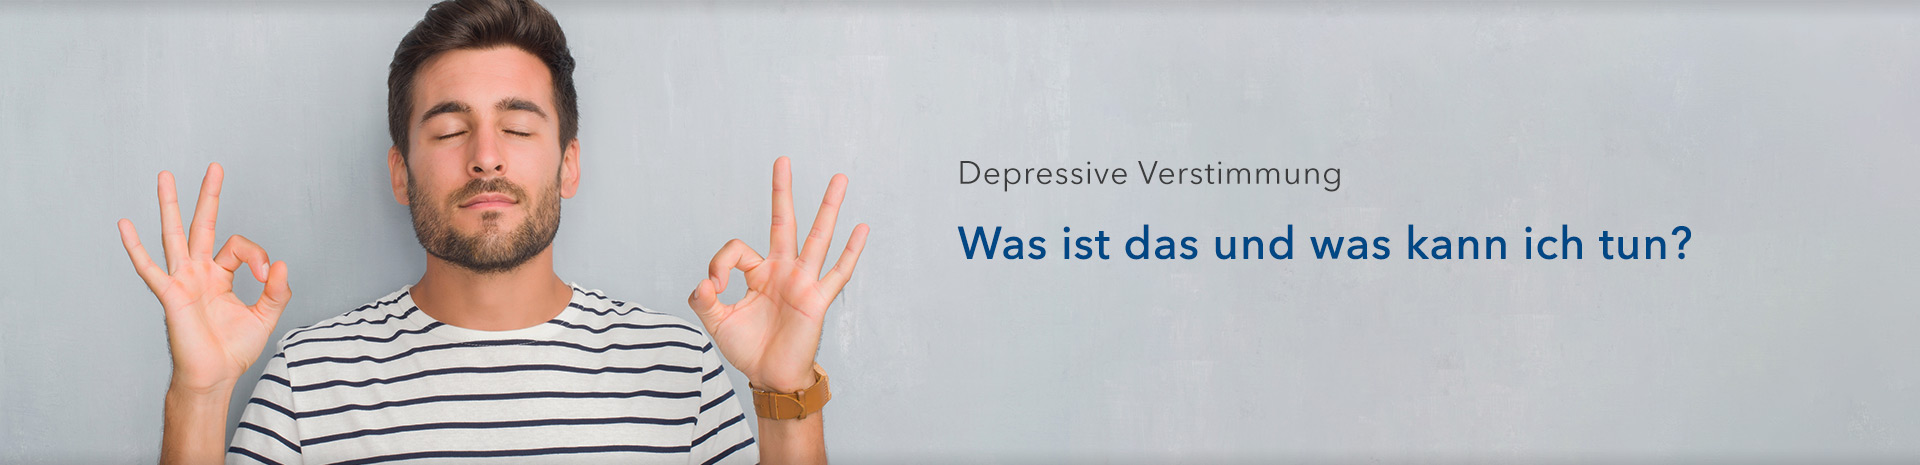 Depressive Verstimmung - Ratgeber - shop-apotheke.at